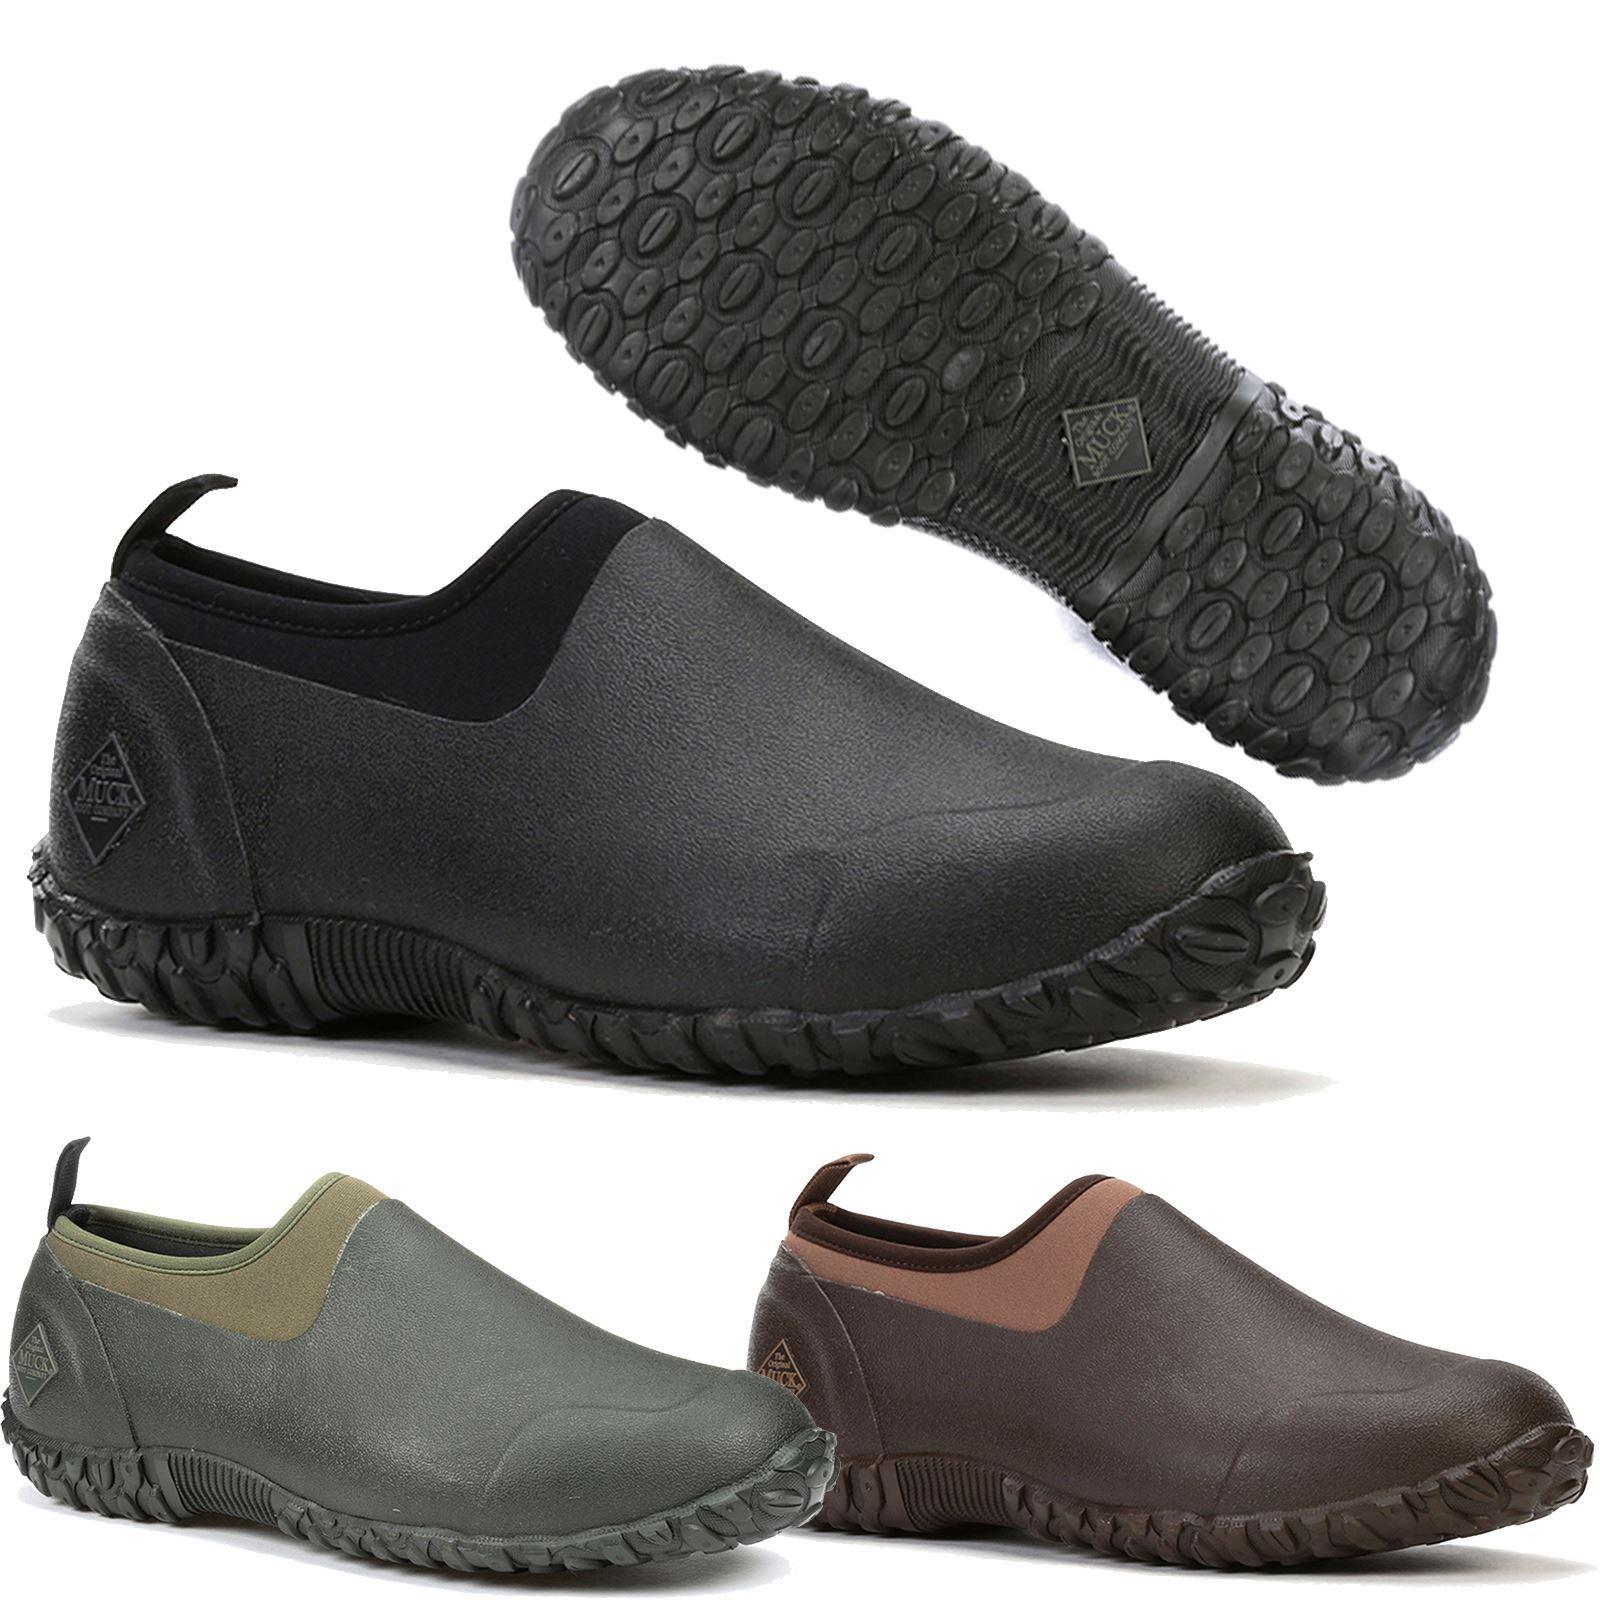 Mens Horse Riders New Rain Splasher Outdoor Walking Summer Comfy Neoprene Boots